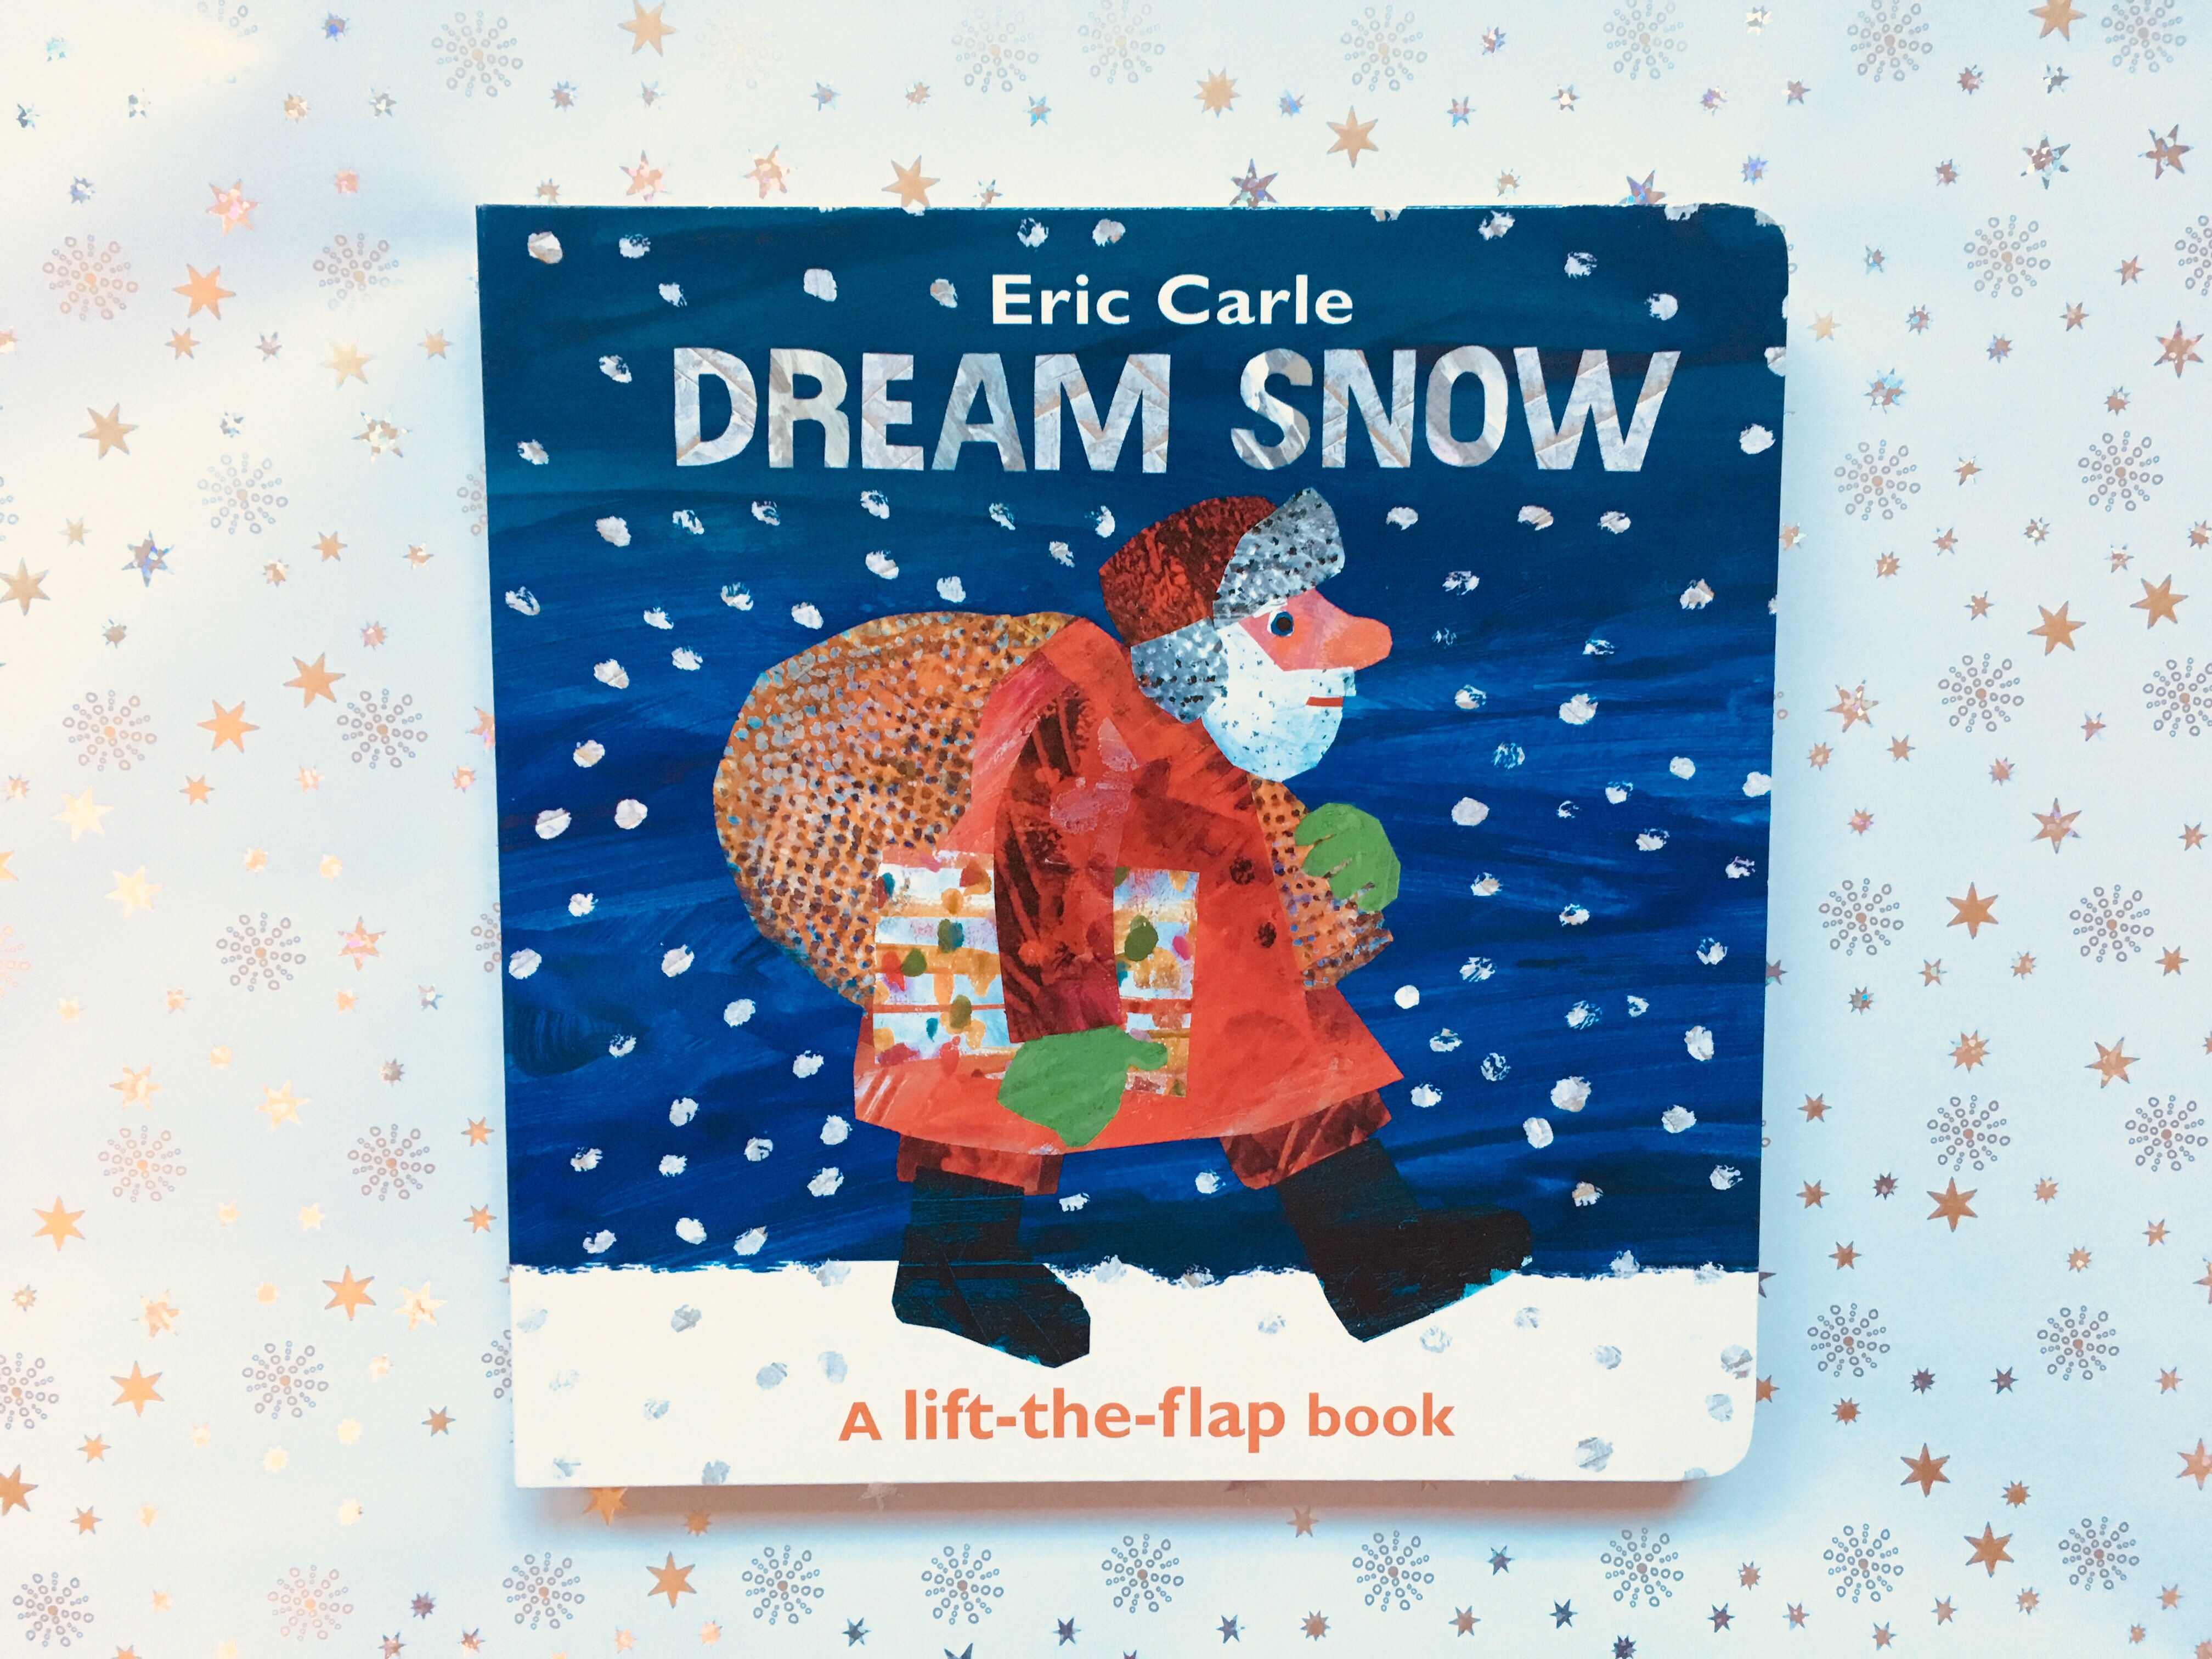 2 dream snow by eric carle 699 puffin - Books About Santa Claus 2